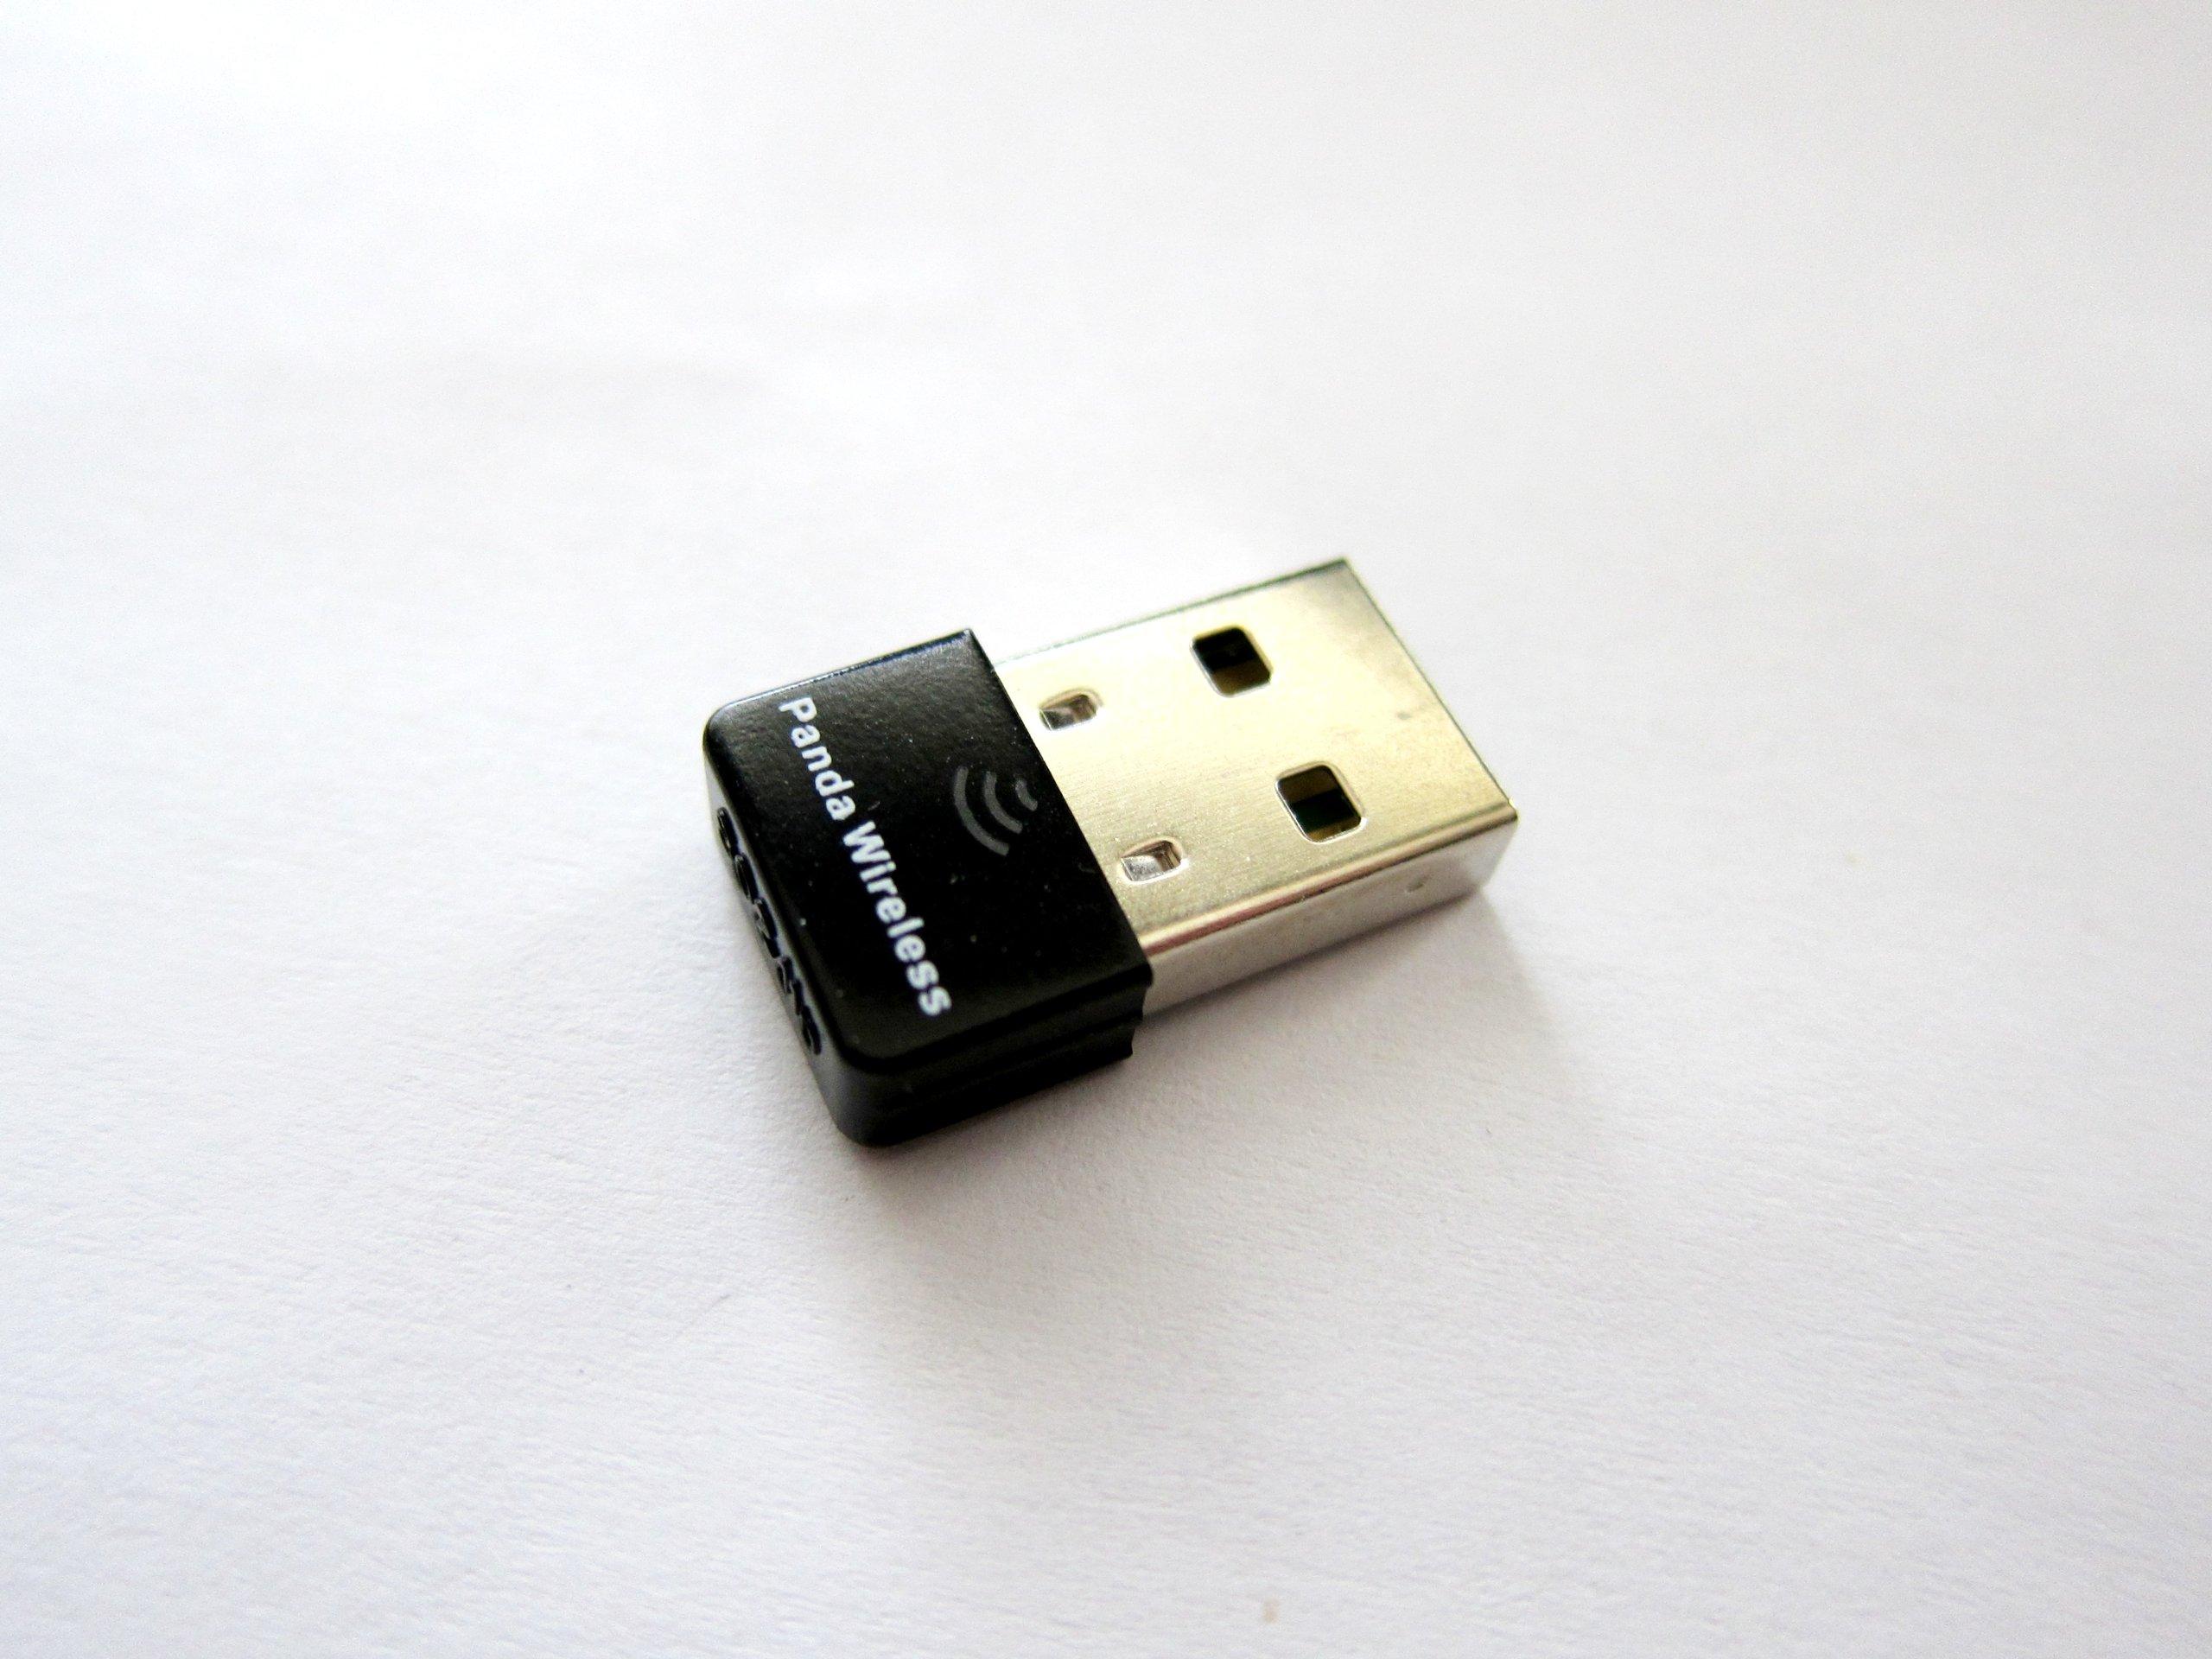 Panda Ultra 150Mbps Wireless N USB Adapter - Windows XP/Vista/7/8/8.1/10, Mac OS X 10.4-10.10, Mint, Ubuntu, Fedora, openSUSE, BackTrack5 R3, Kali Linux and Raspberry Pi 1/Pi 2 by Panda Wireless